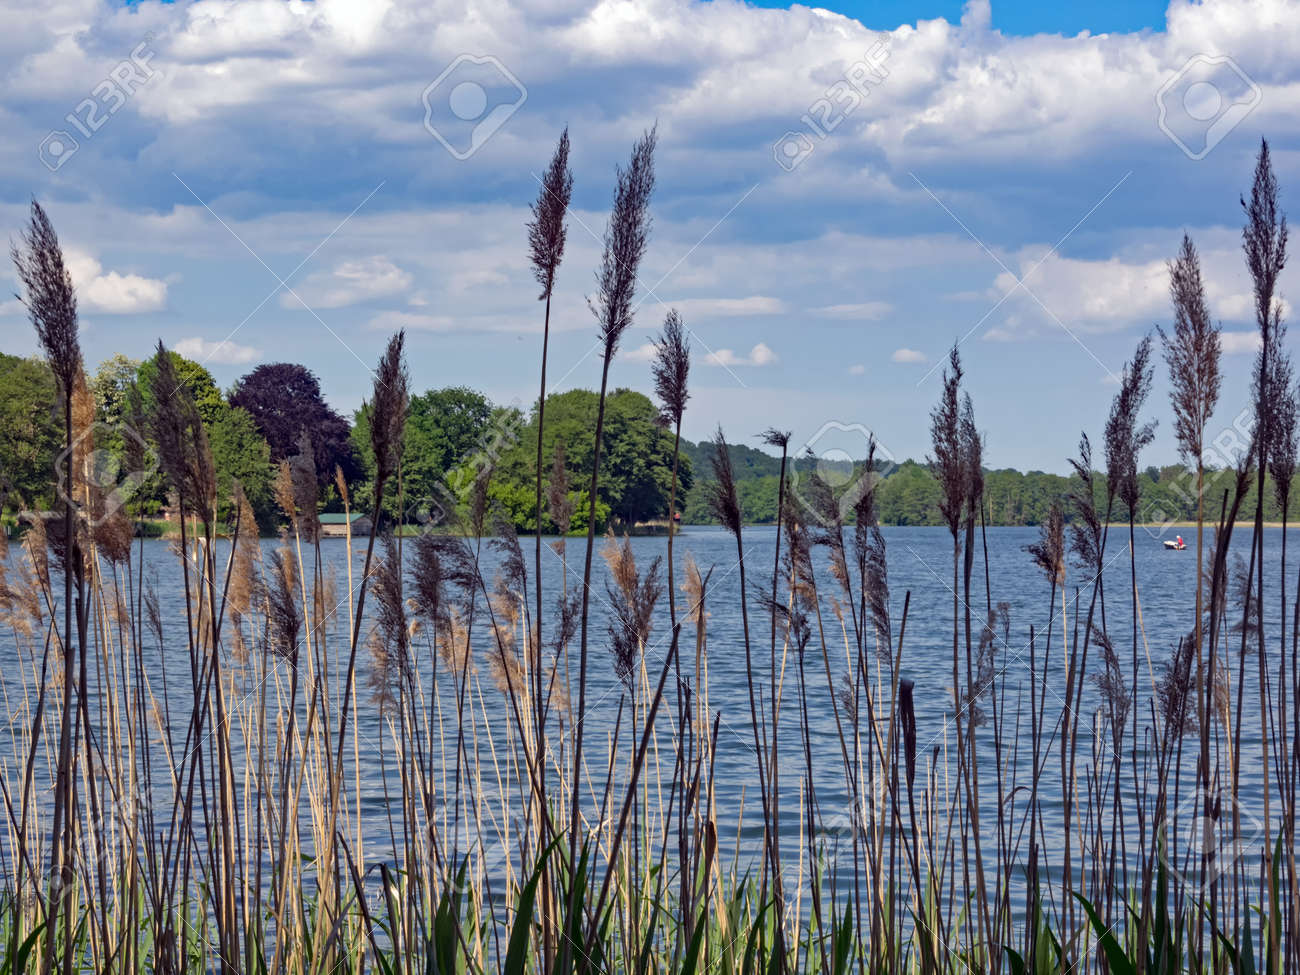 "Lake ""Haussee"" in the Feldberg lakes, Mecklenburg-Western Pomerania, Germany - 164494389"